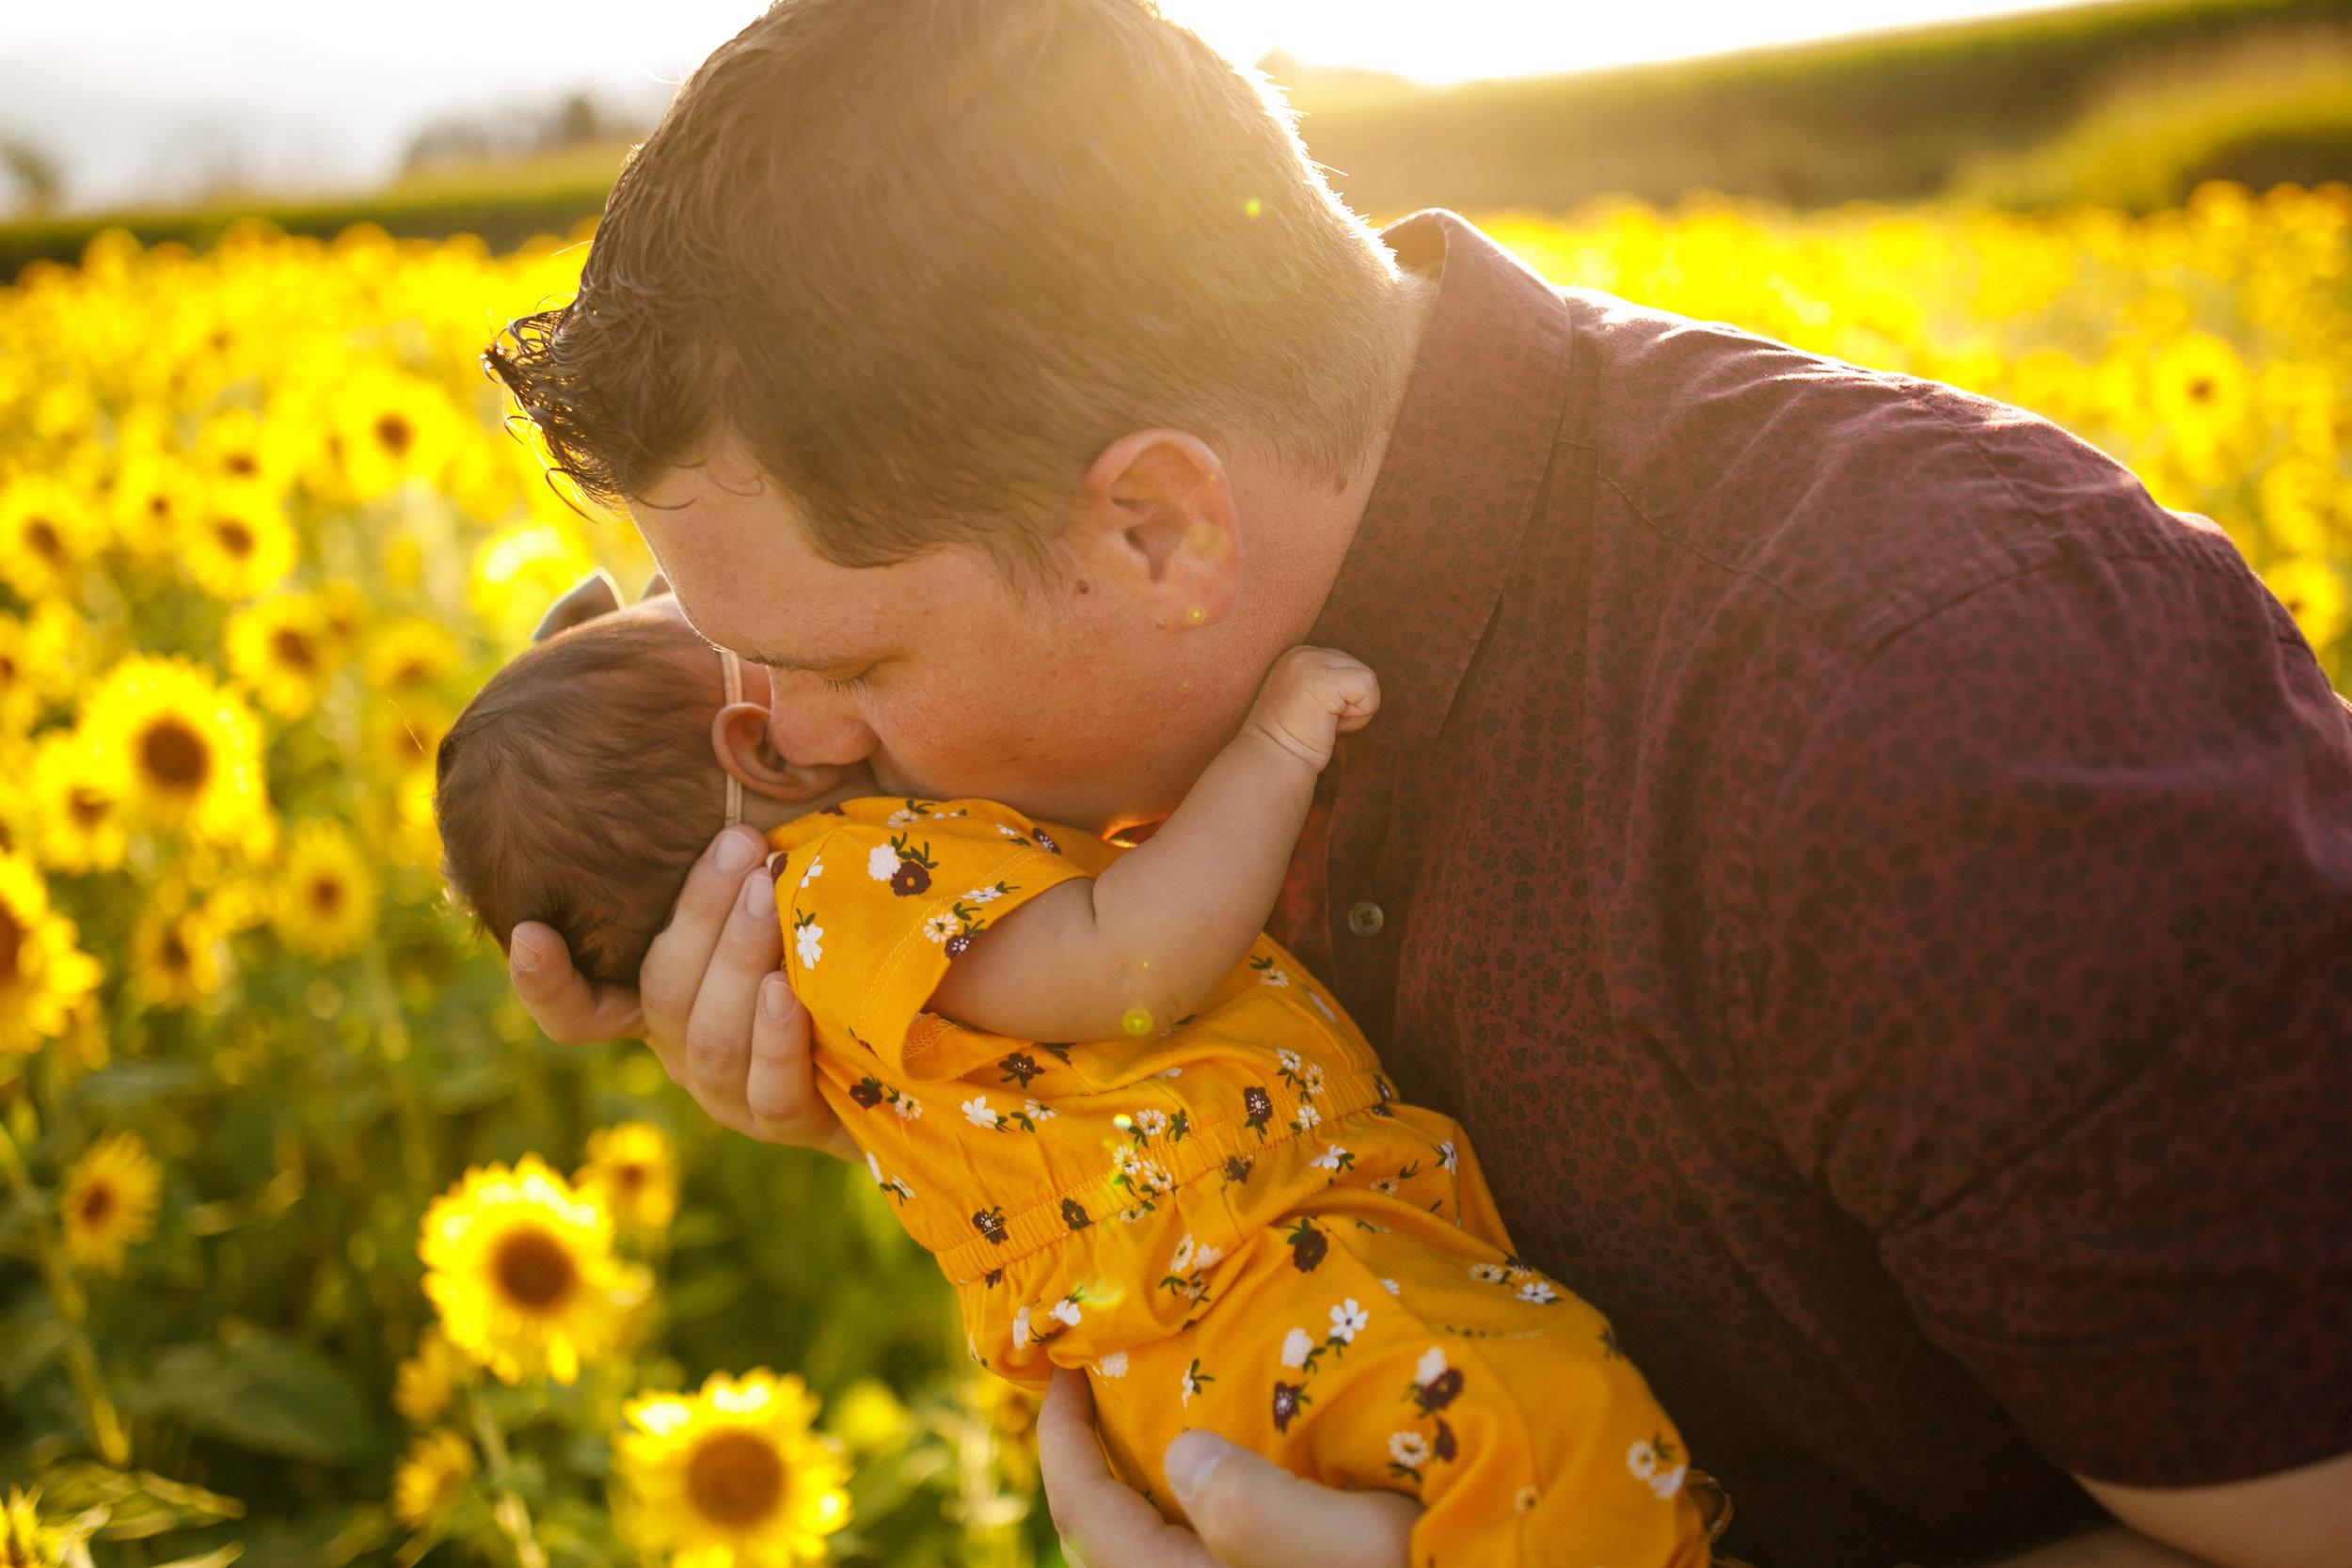 Morris Family Summer 2019 - Grand Rapids Photographer - Grand Rapids Family Photographer - Ed Dunneback and Girls - J Darling Photo 006.jpg